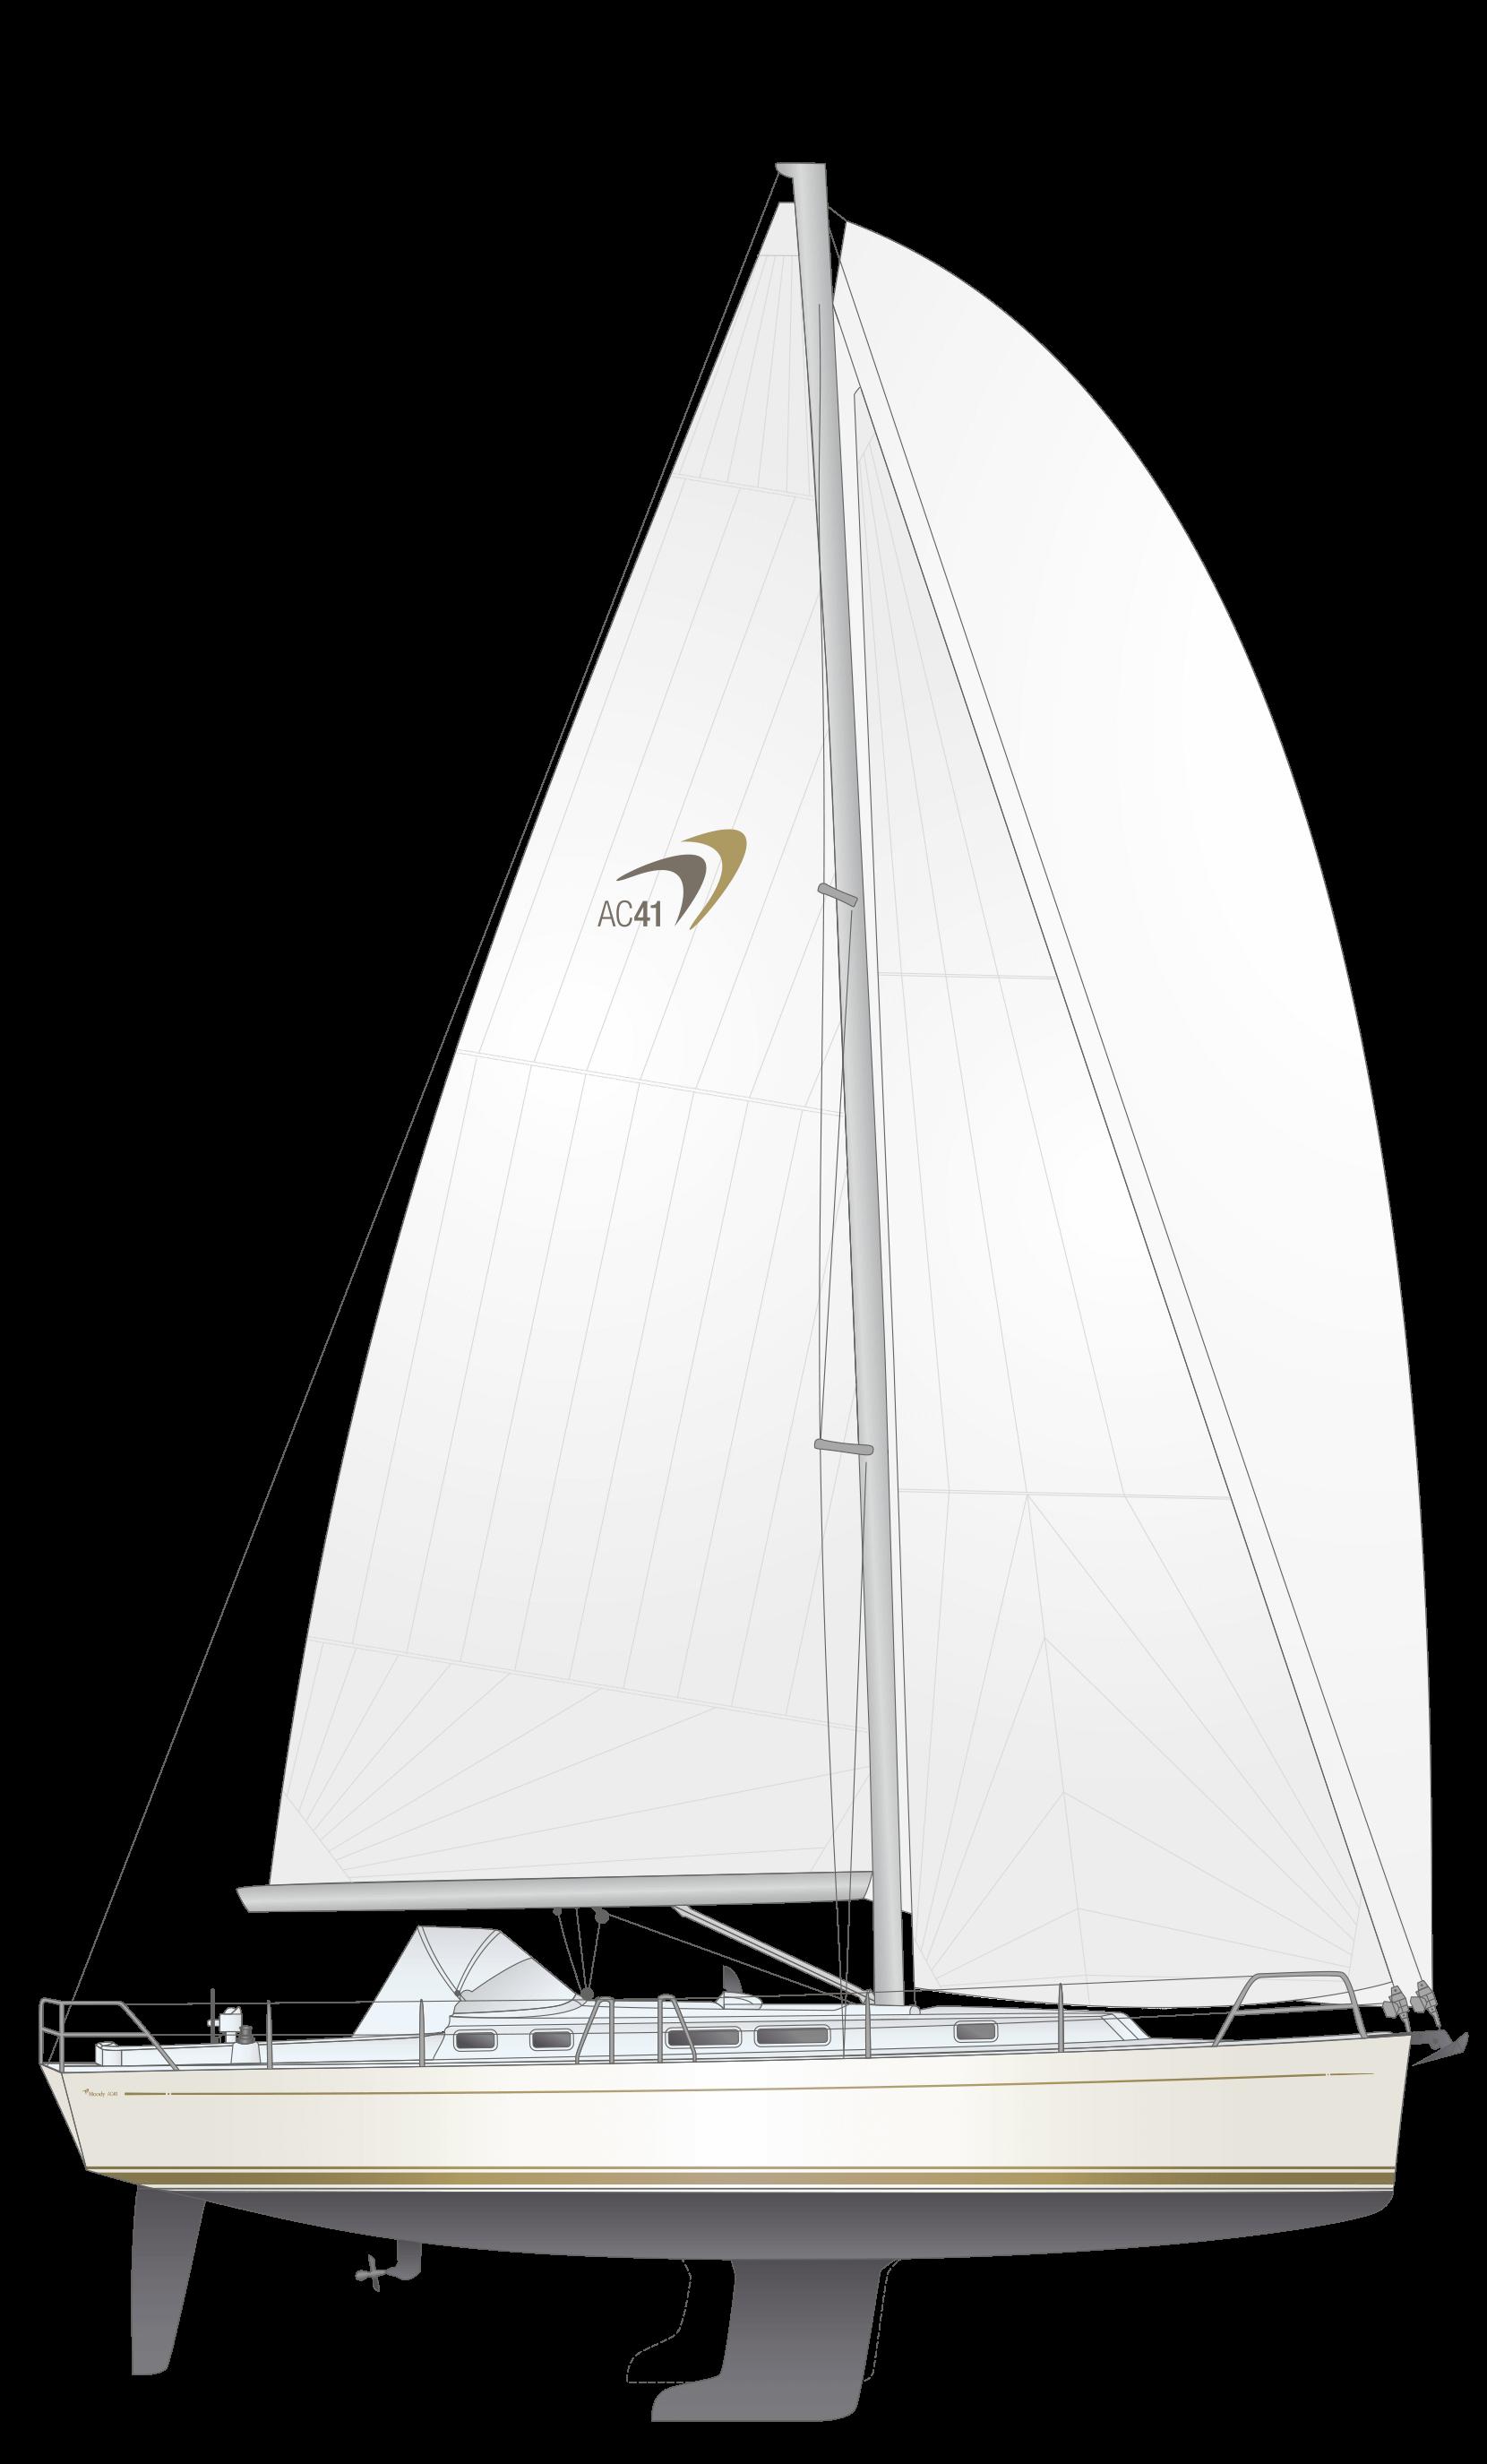 Aft Cockpit 41